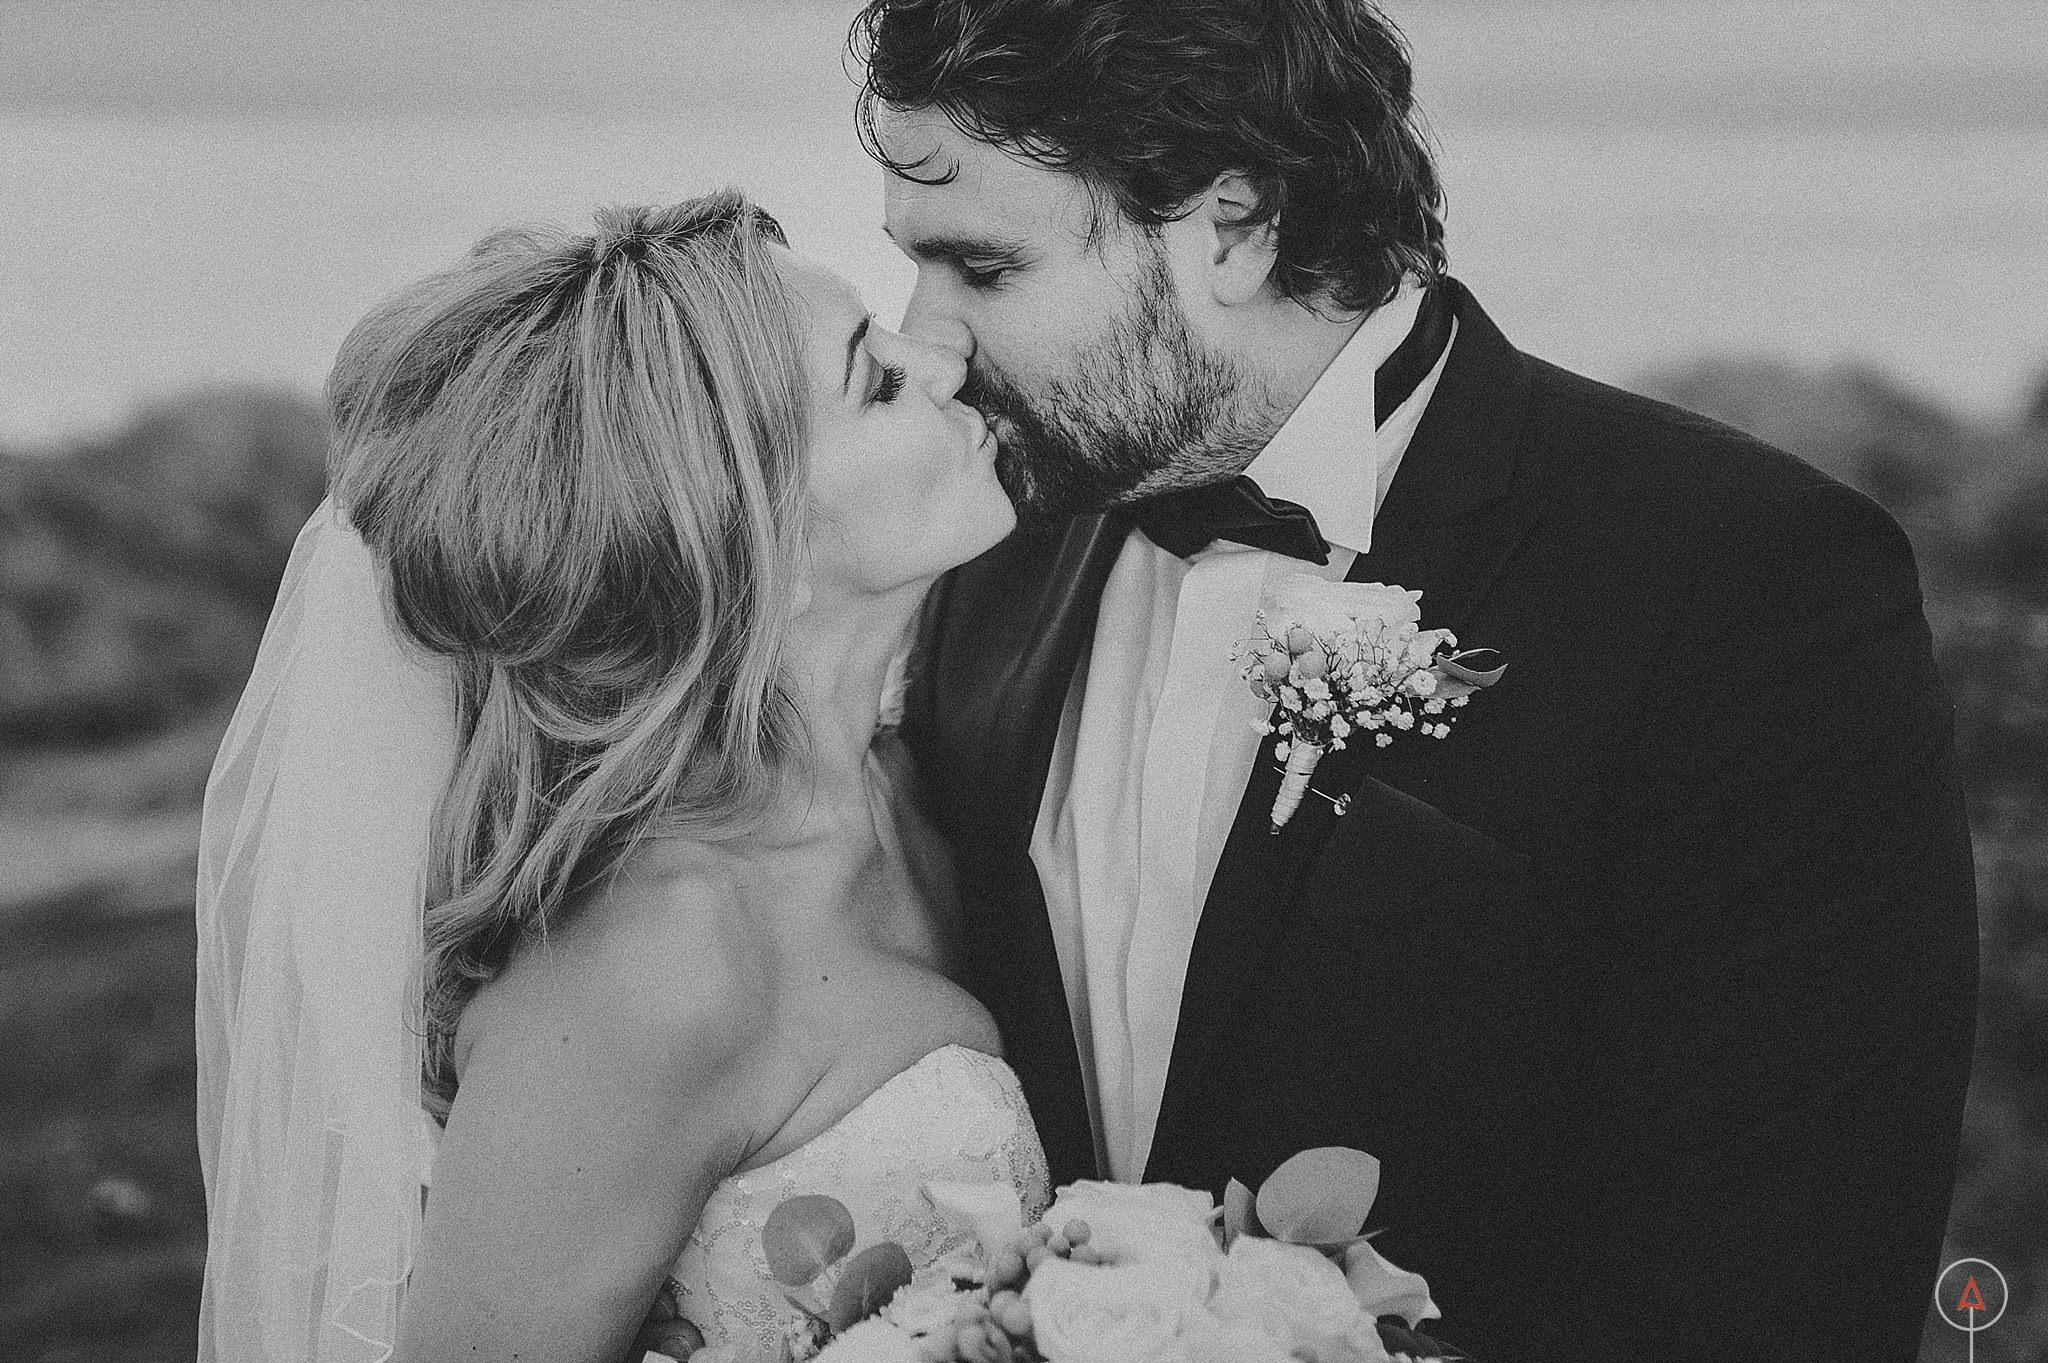 cardiff-wedding-photographer-aga-tomaszek_0410